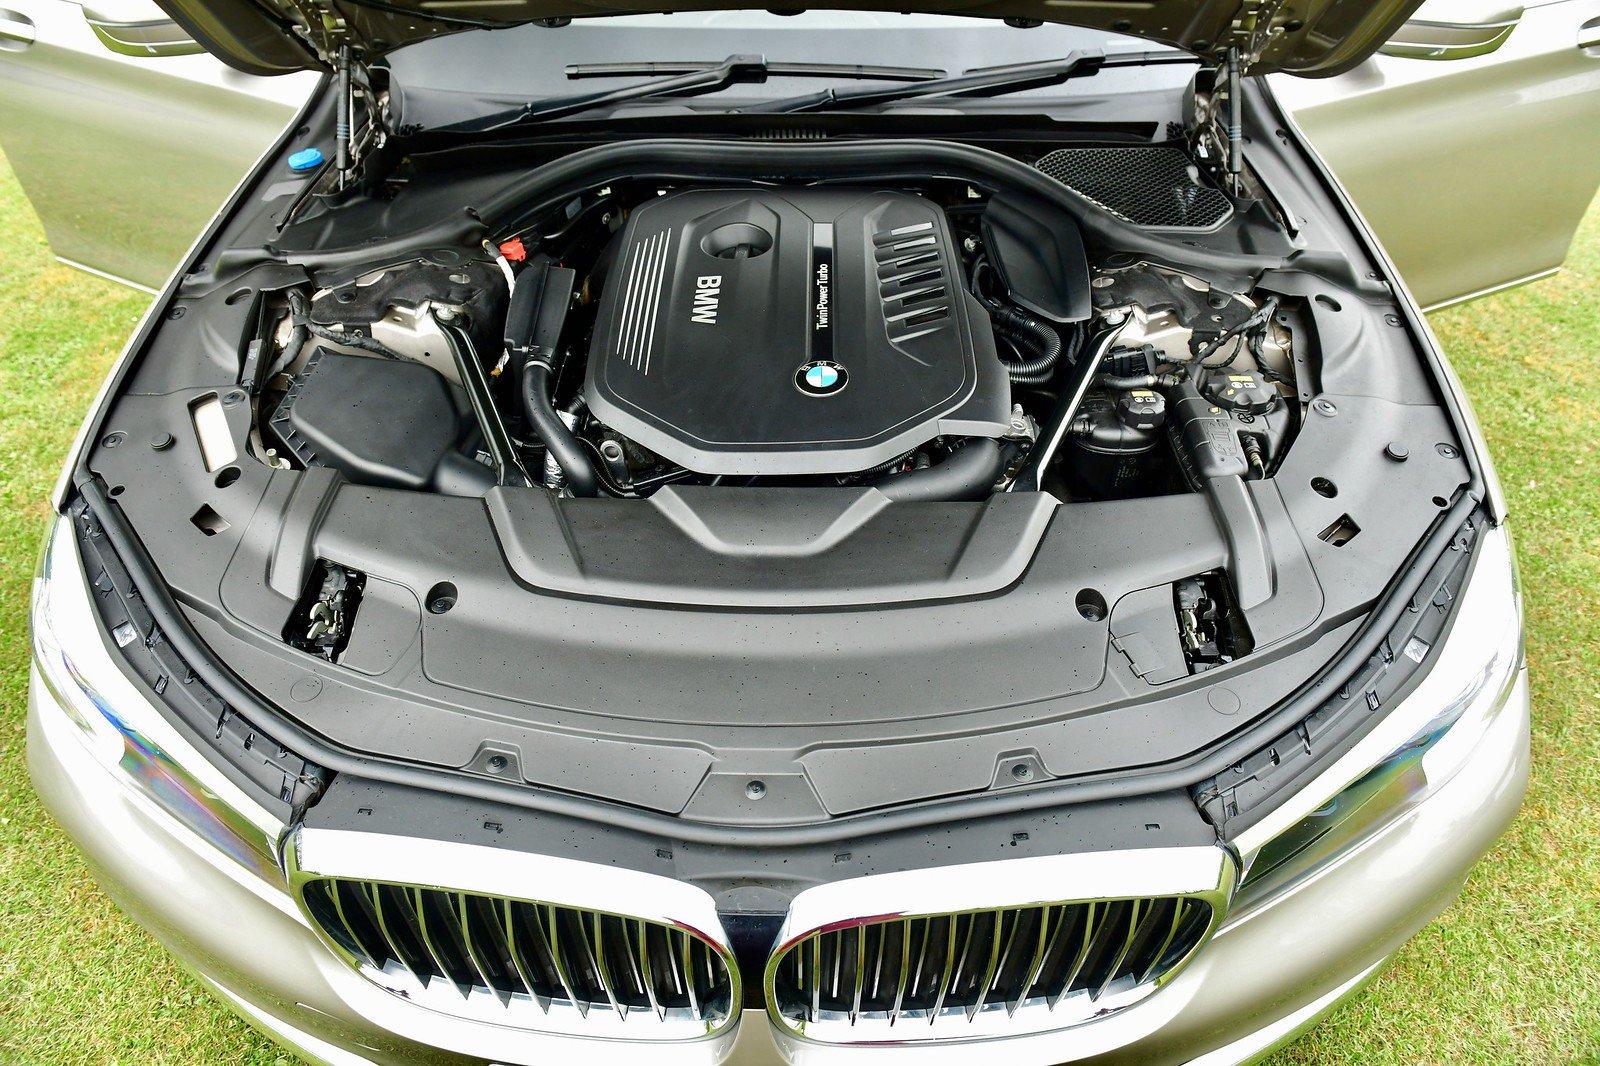 2016 BMW 7 Series Twin Turbo  740Li LWB Saloon 4dr Petrol  SOLD (picture 6 of 6)